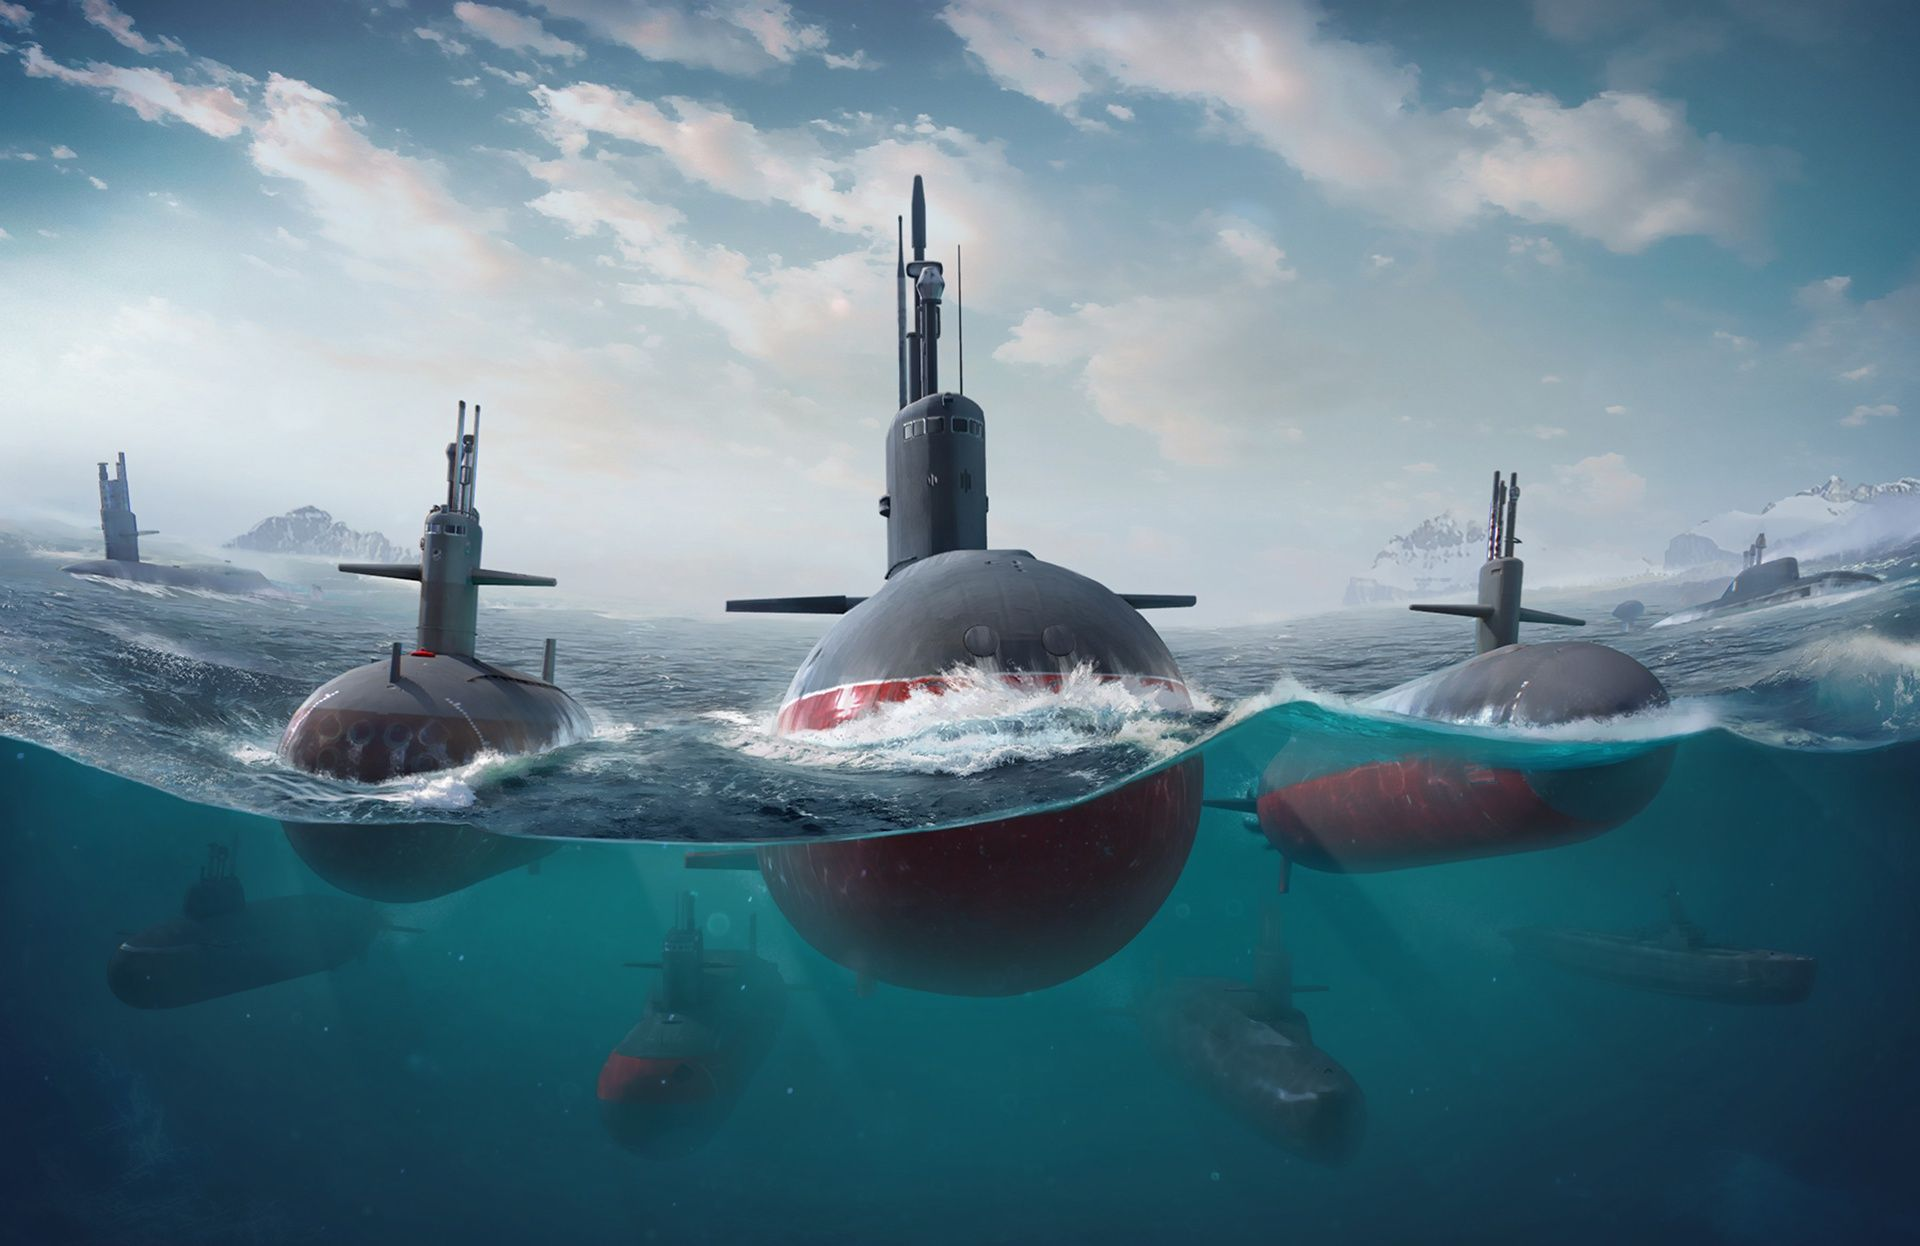 Pin by Absalon L16 on Miszmasz ) in 2020 Submarines